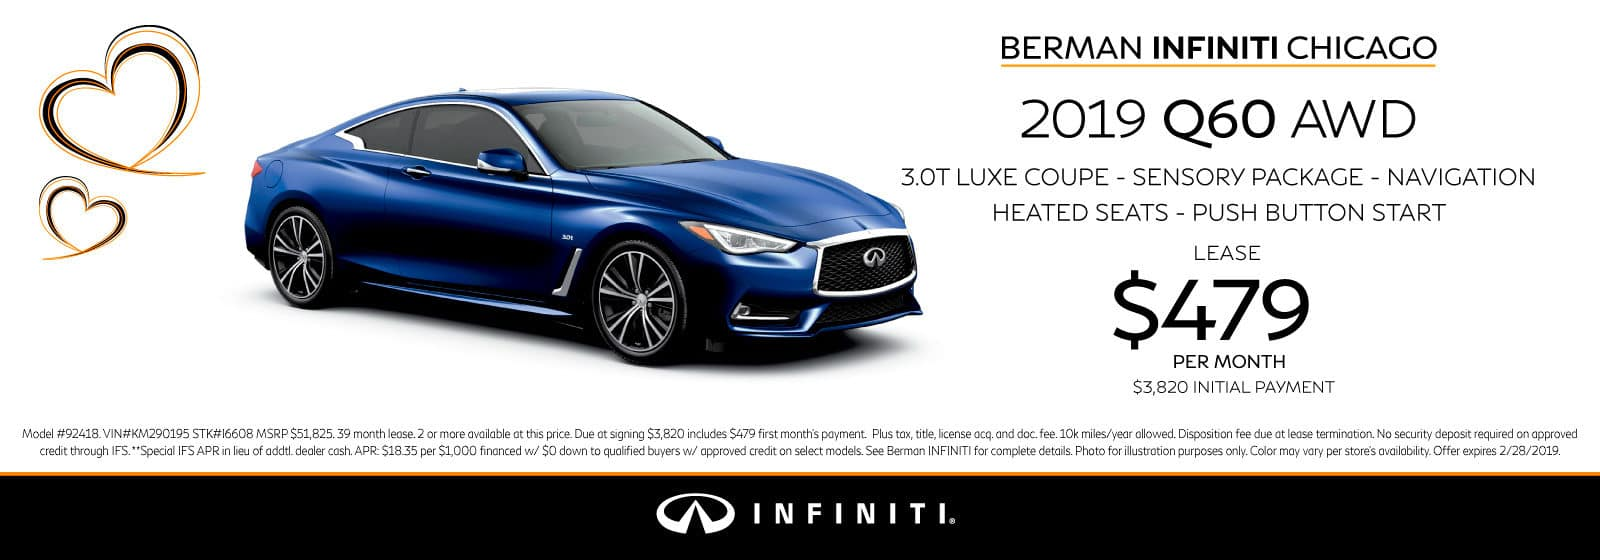 New 2018 INFINITI Q60 February offer at Berman INFINITI Chicago!